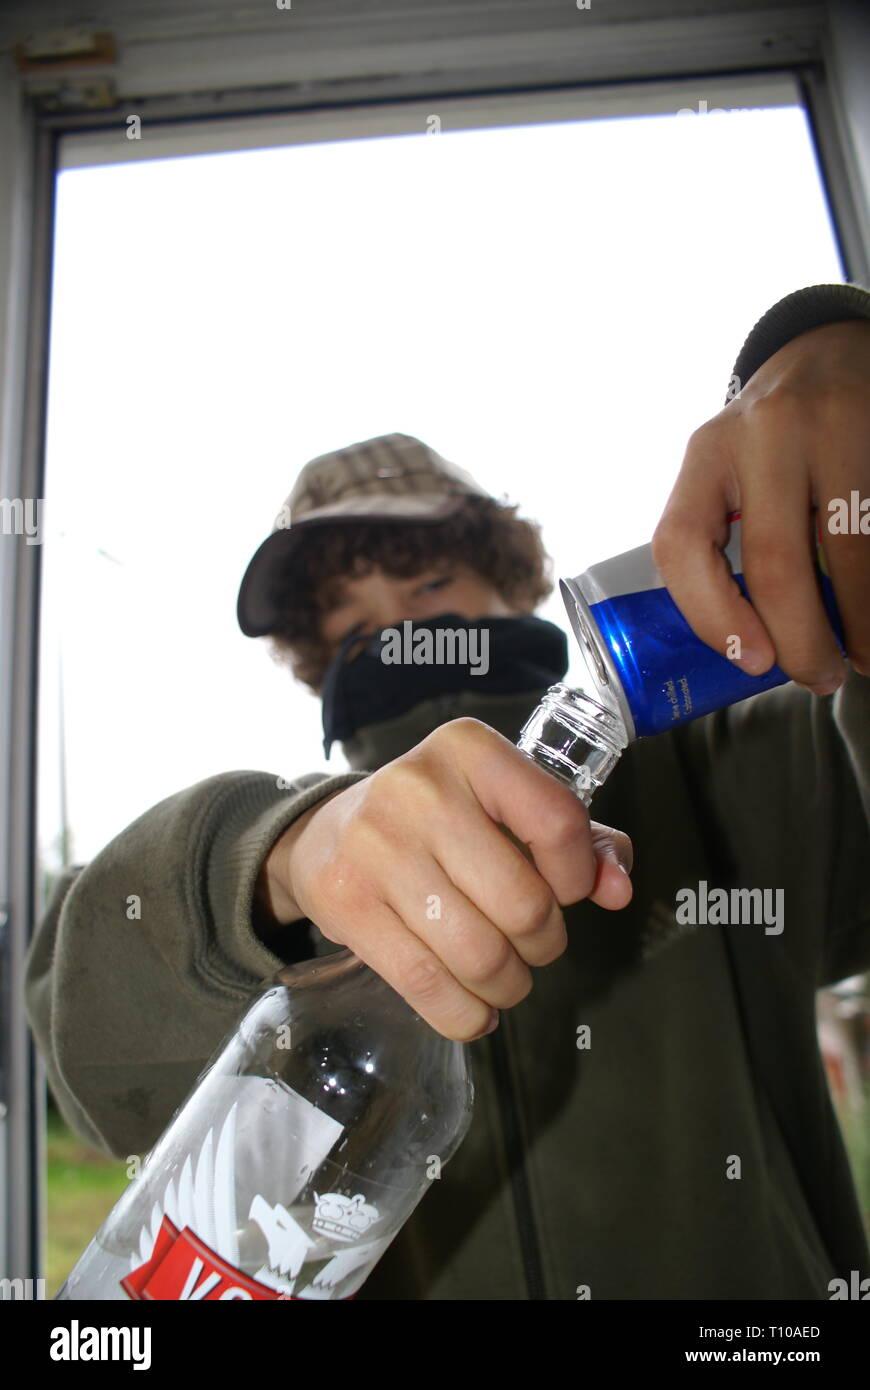 under age drinking, anti social behaviour - Stock Image